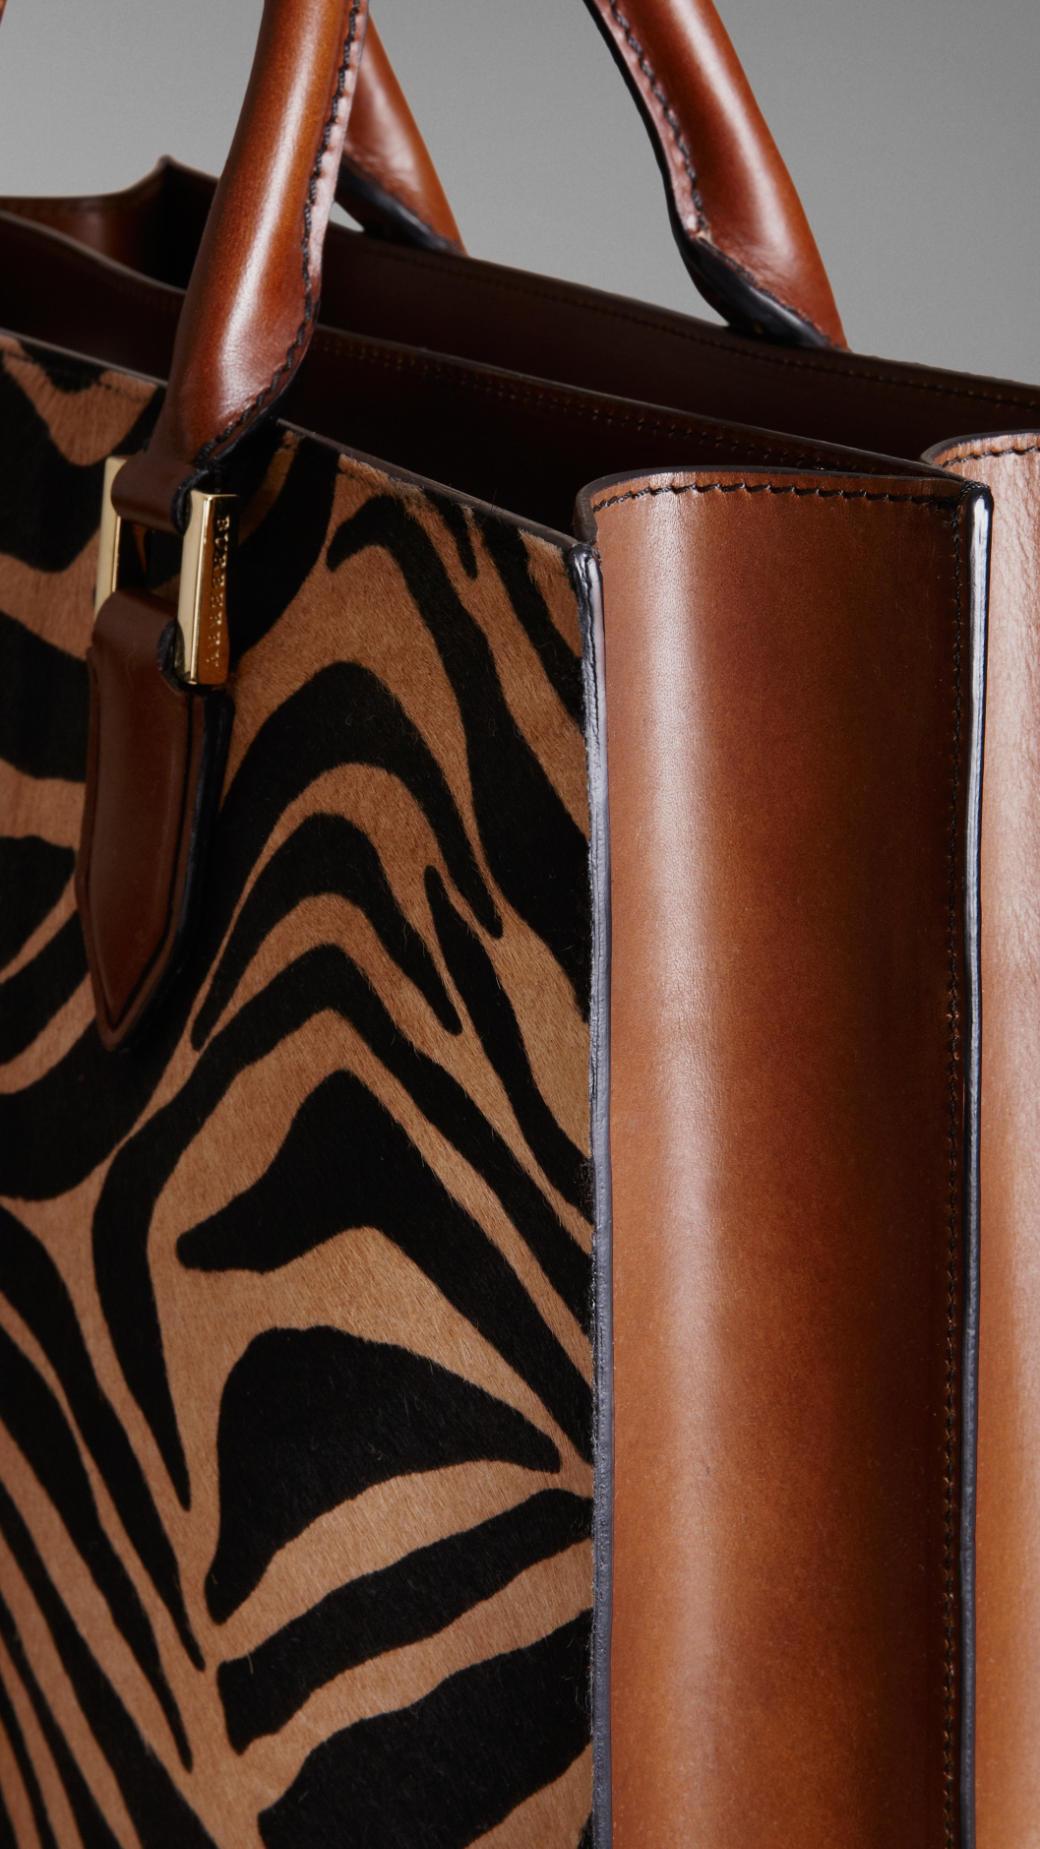 Burberry Striped Animal Print Tote Bag for Men